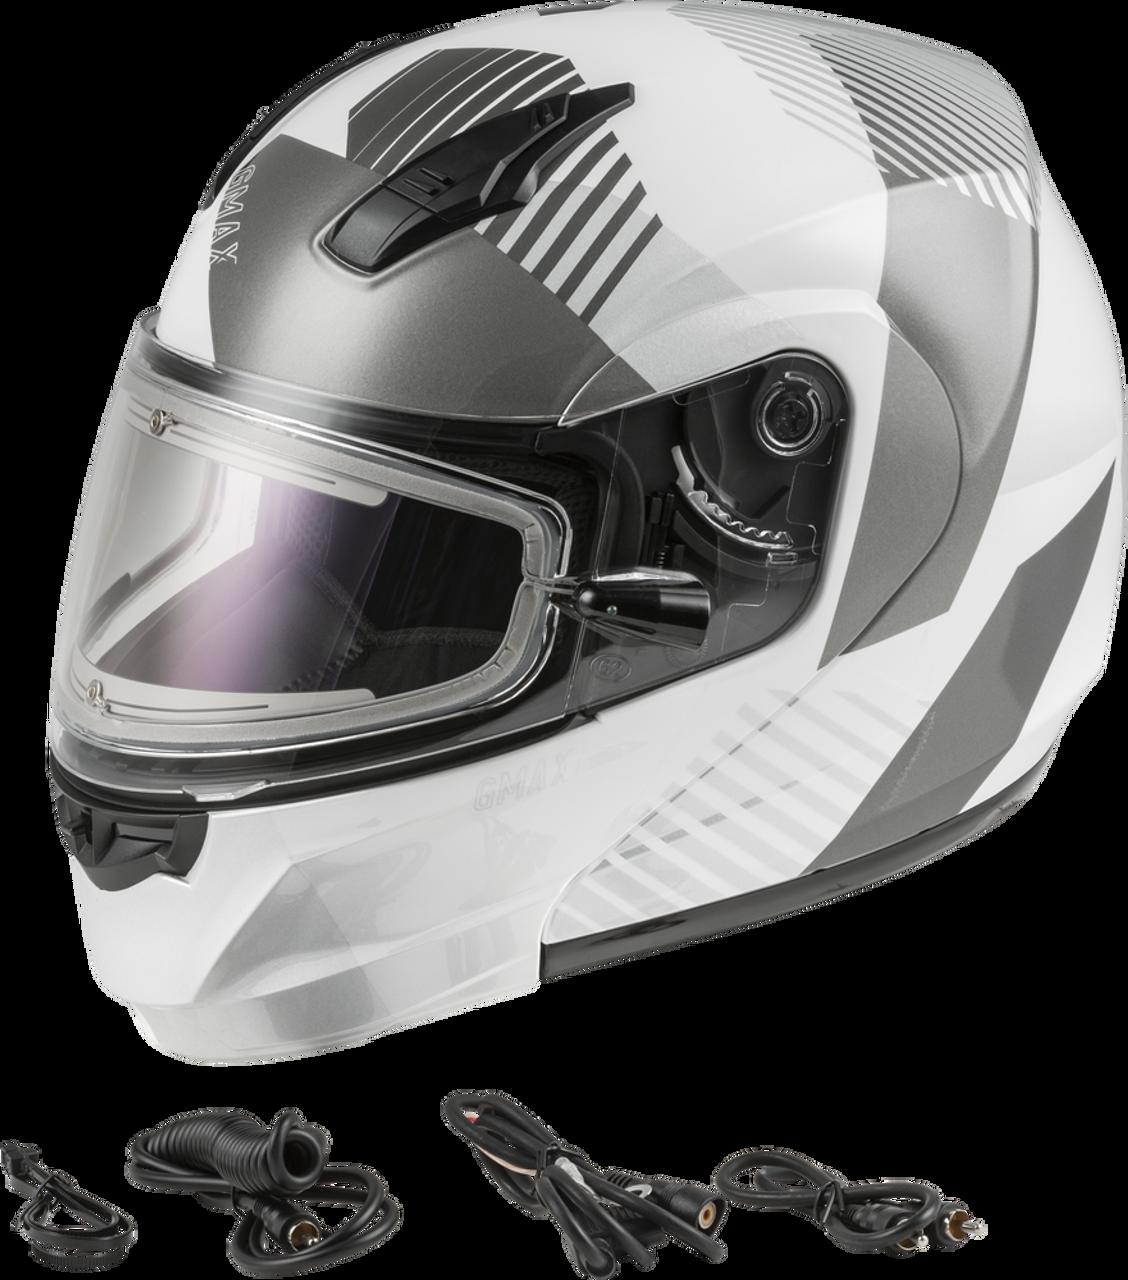 GMAX MD-04S Modular Reserve W/Electric Shield White/Silver